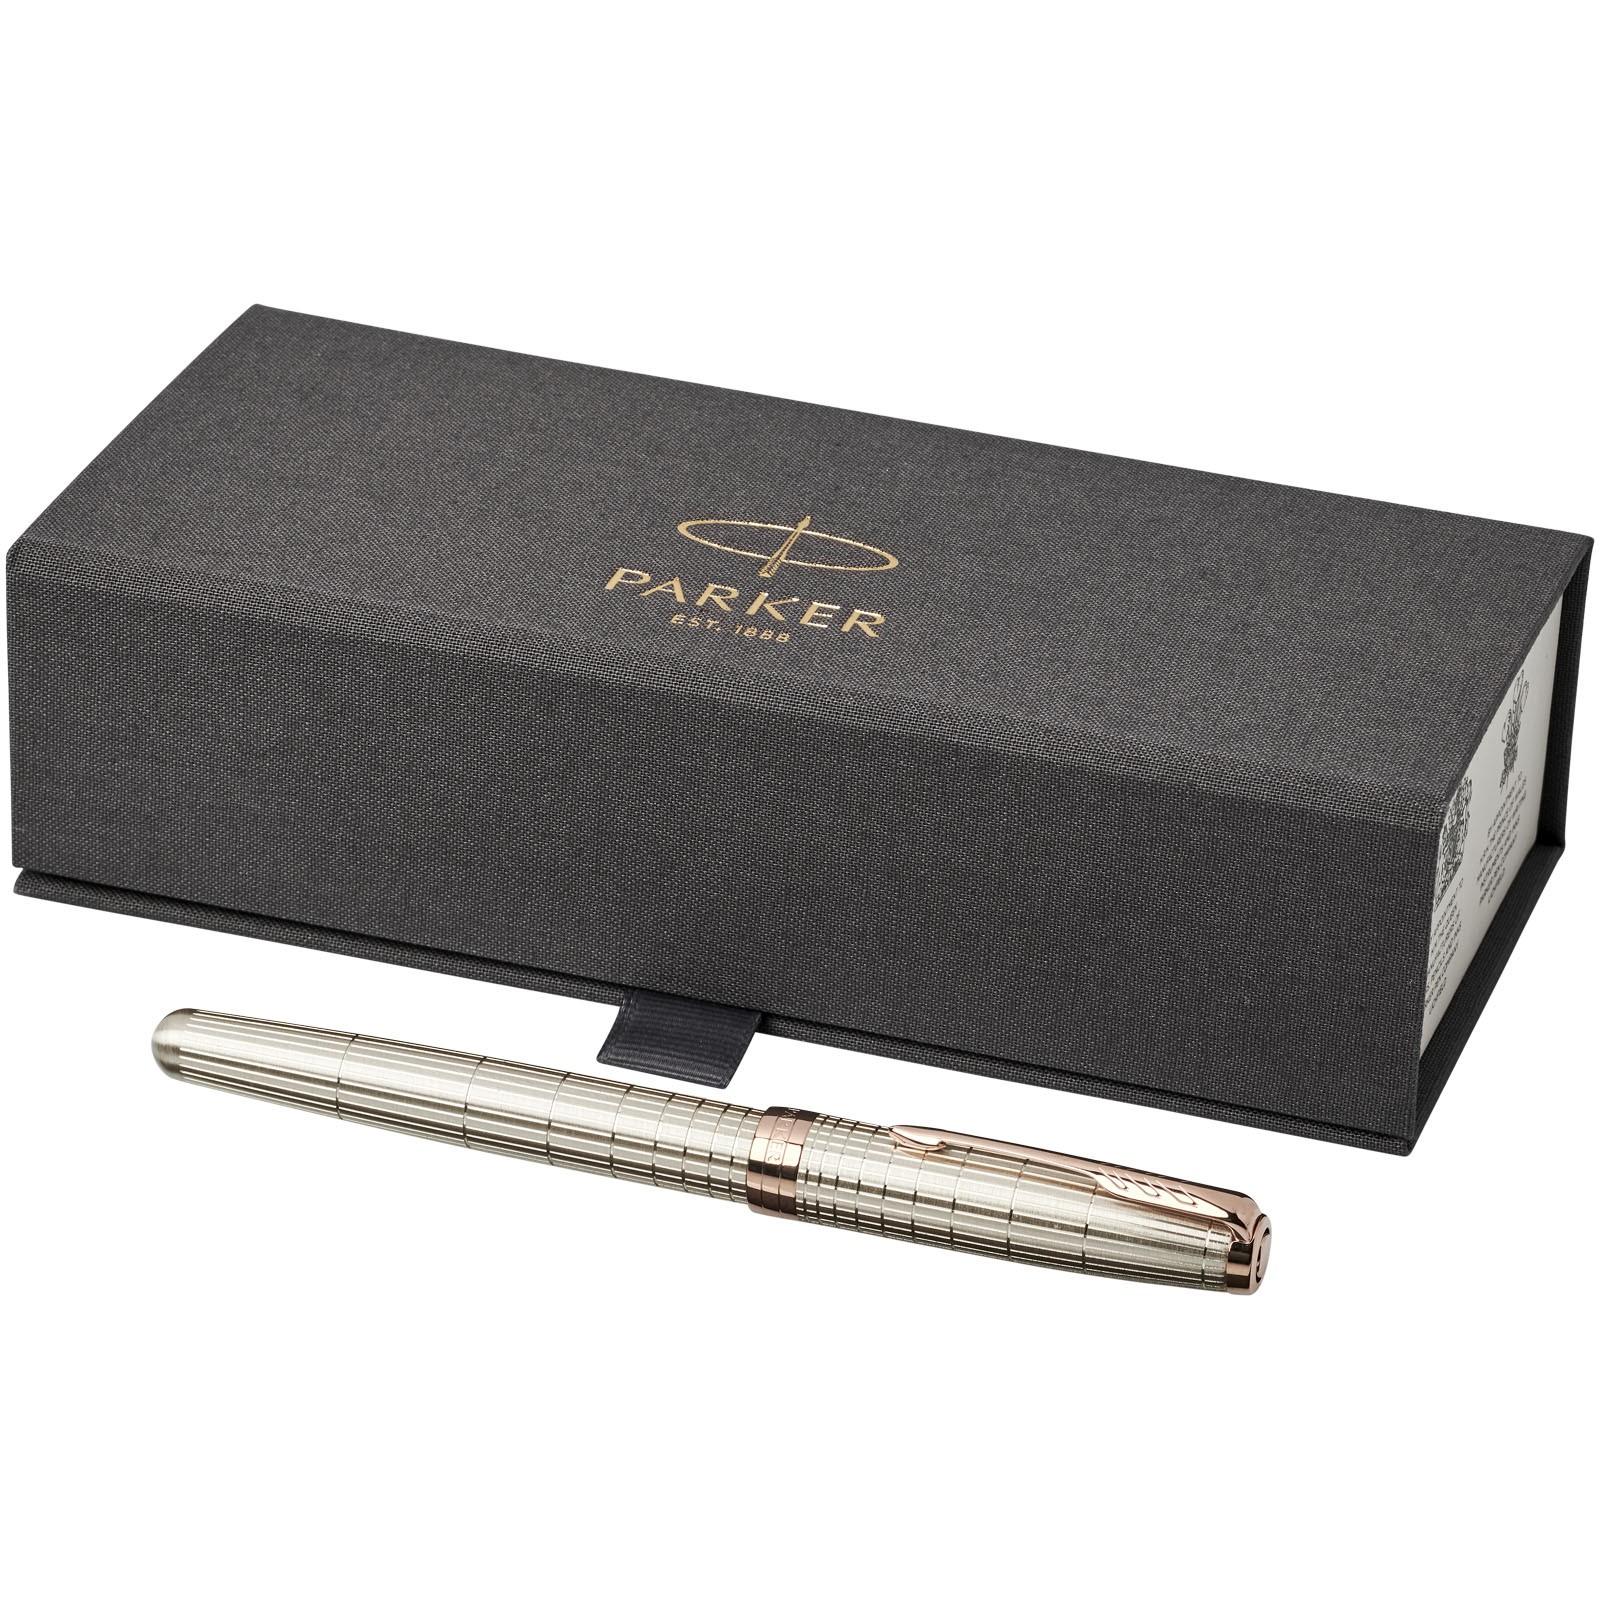 Sonnet rollerball pen - Silver